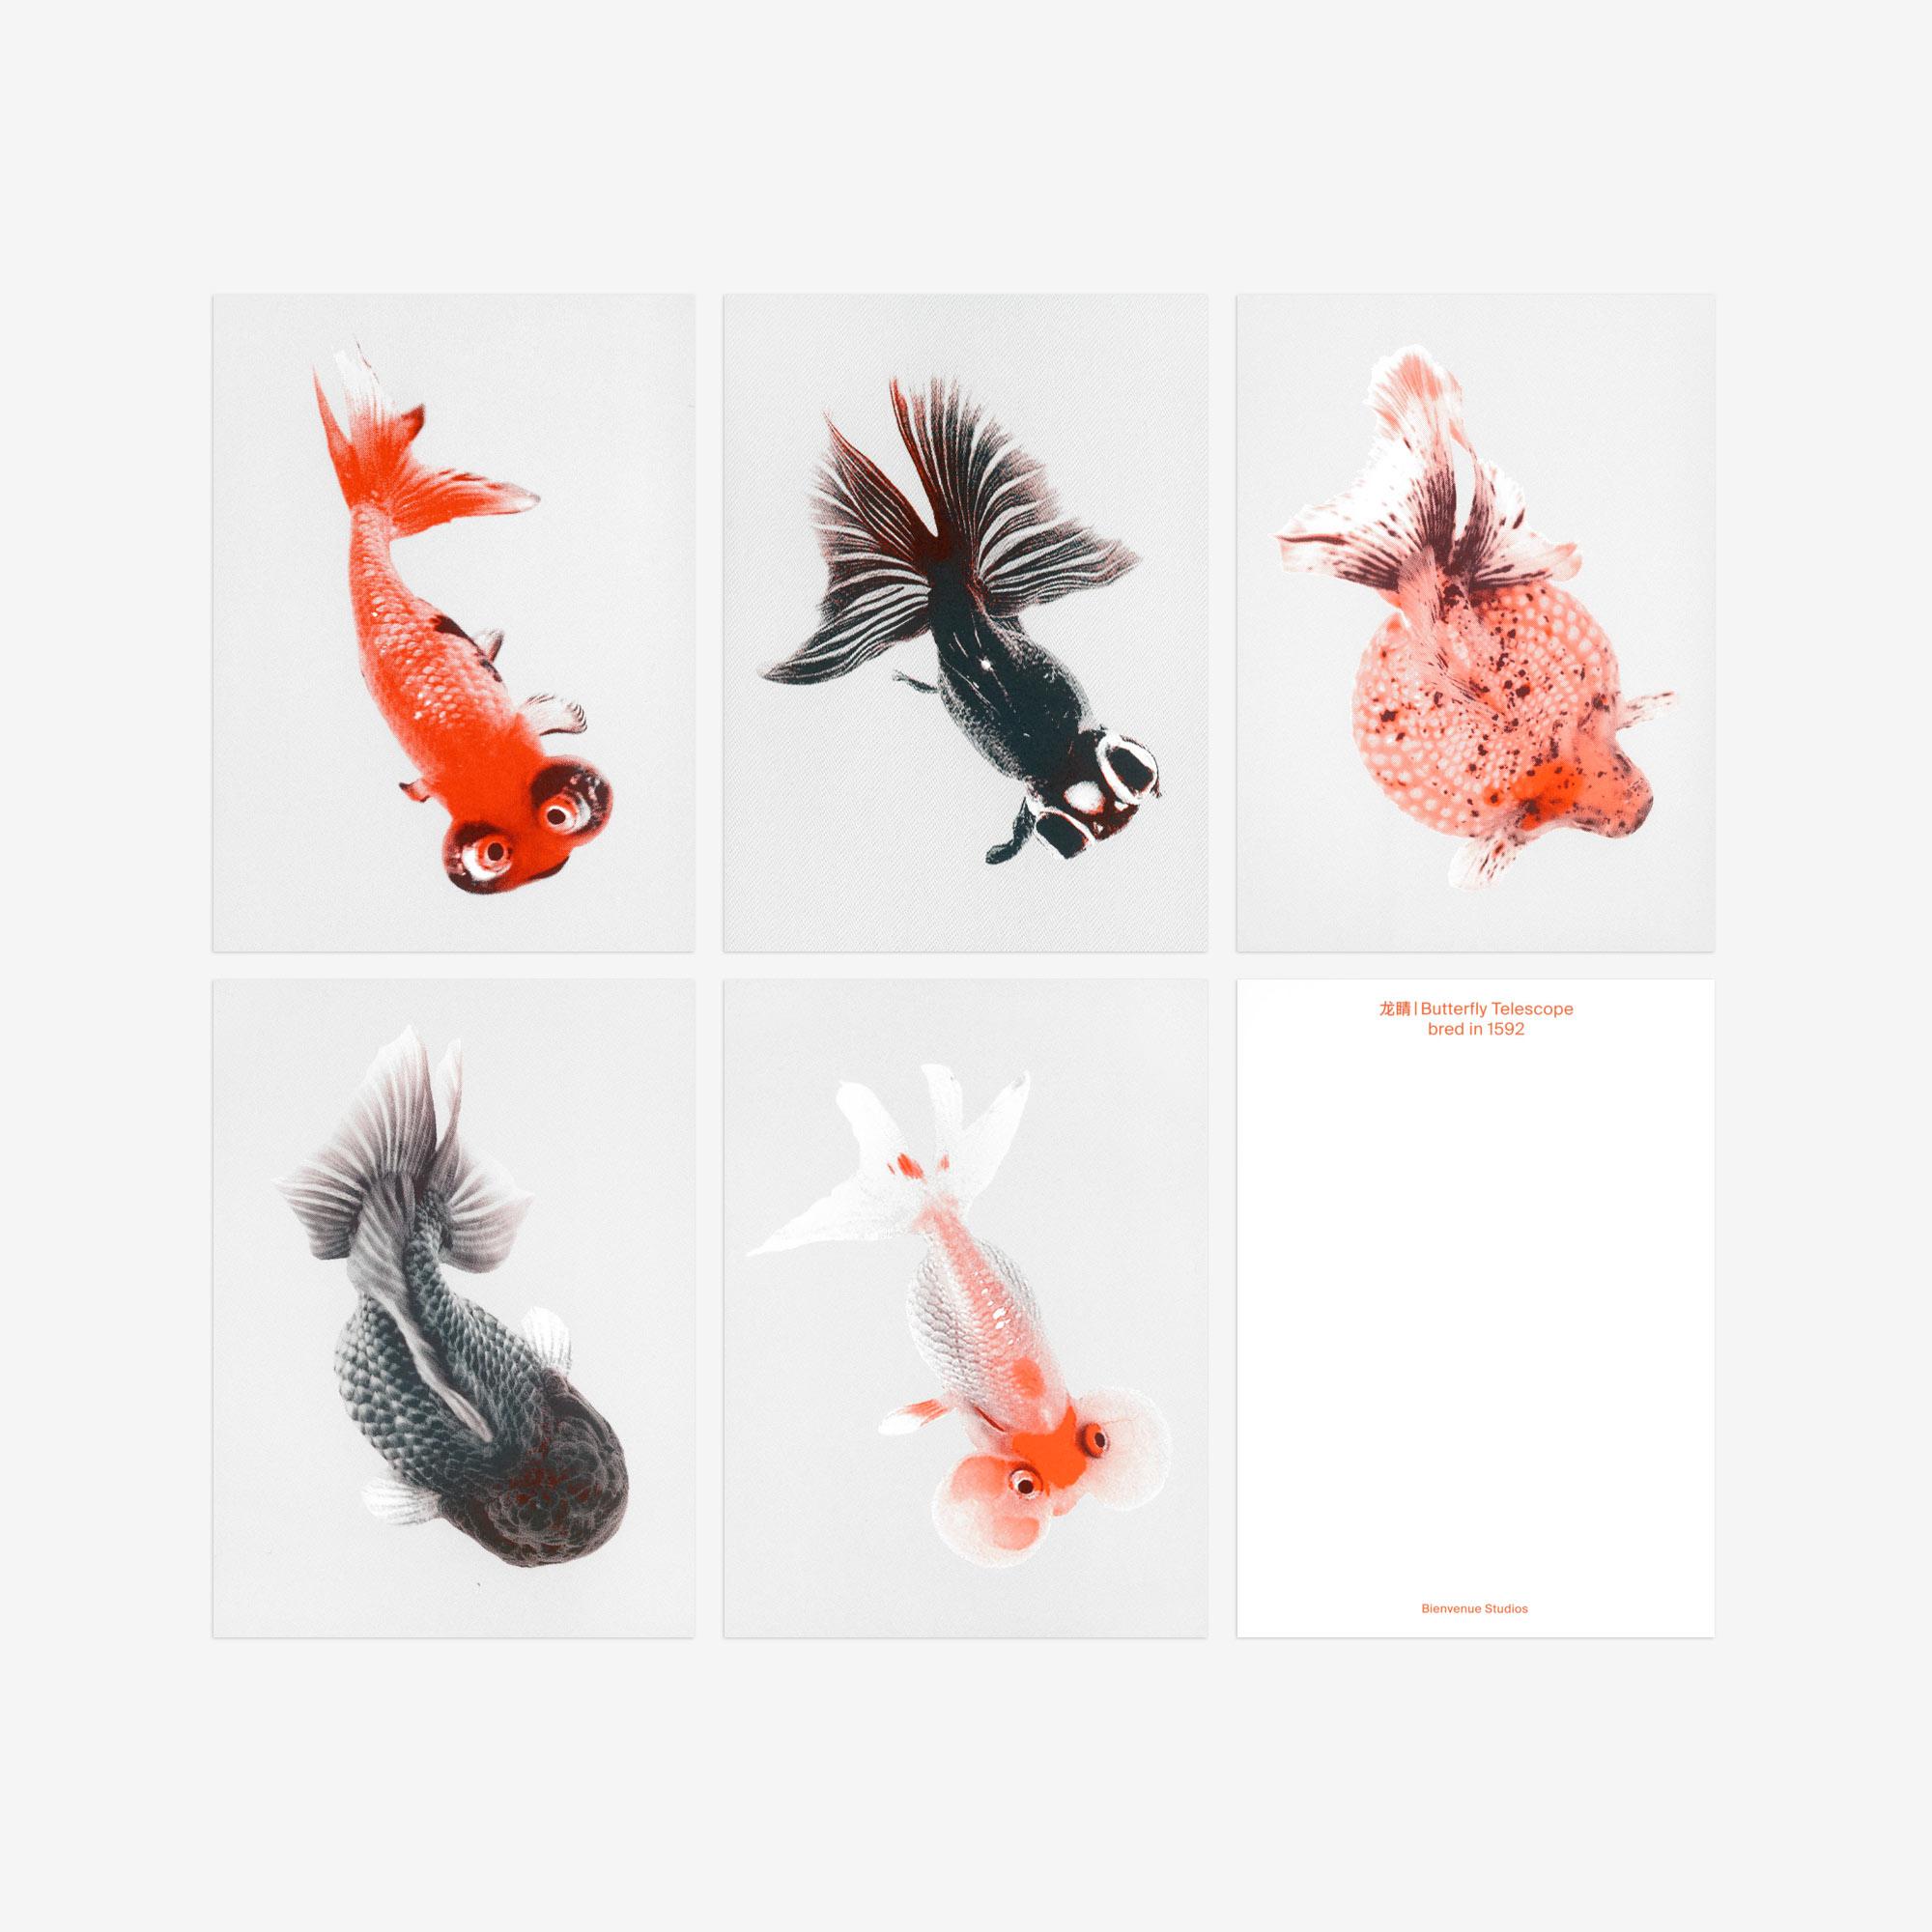 Special goldfish postcards